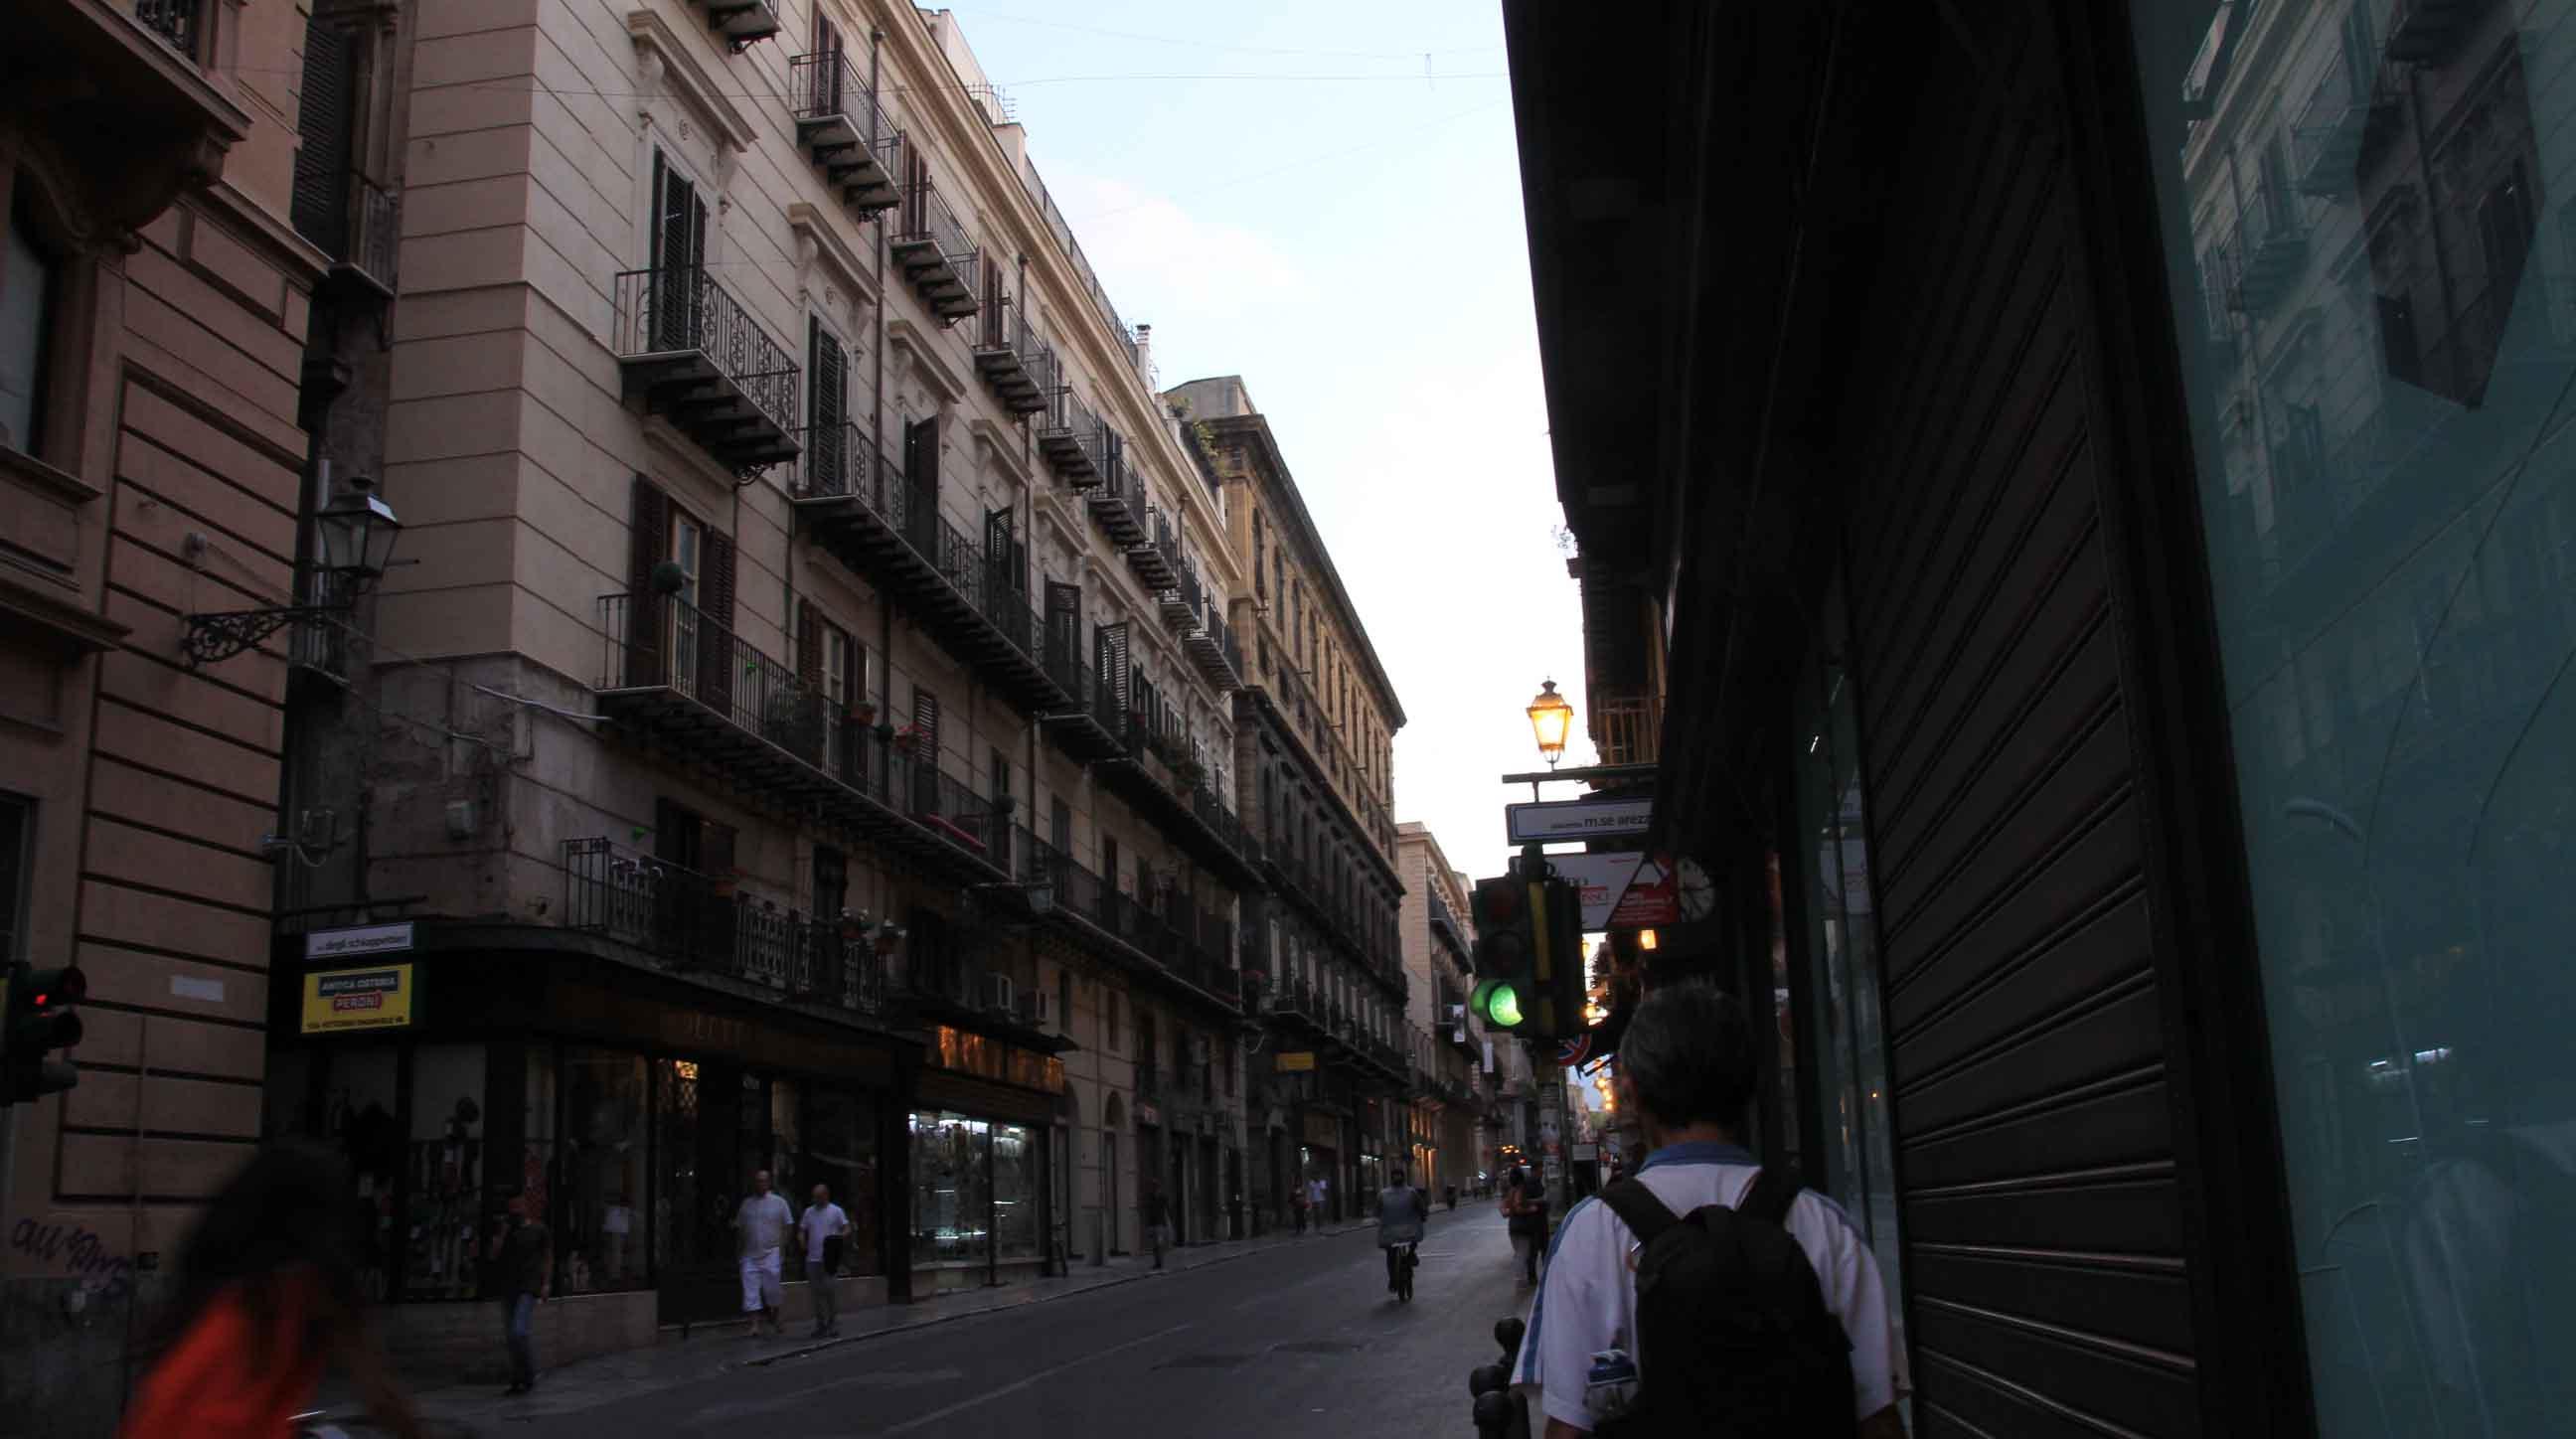 Turning right onto Via Vittorio Emanuele